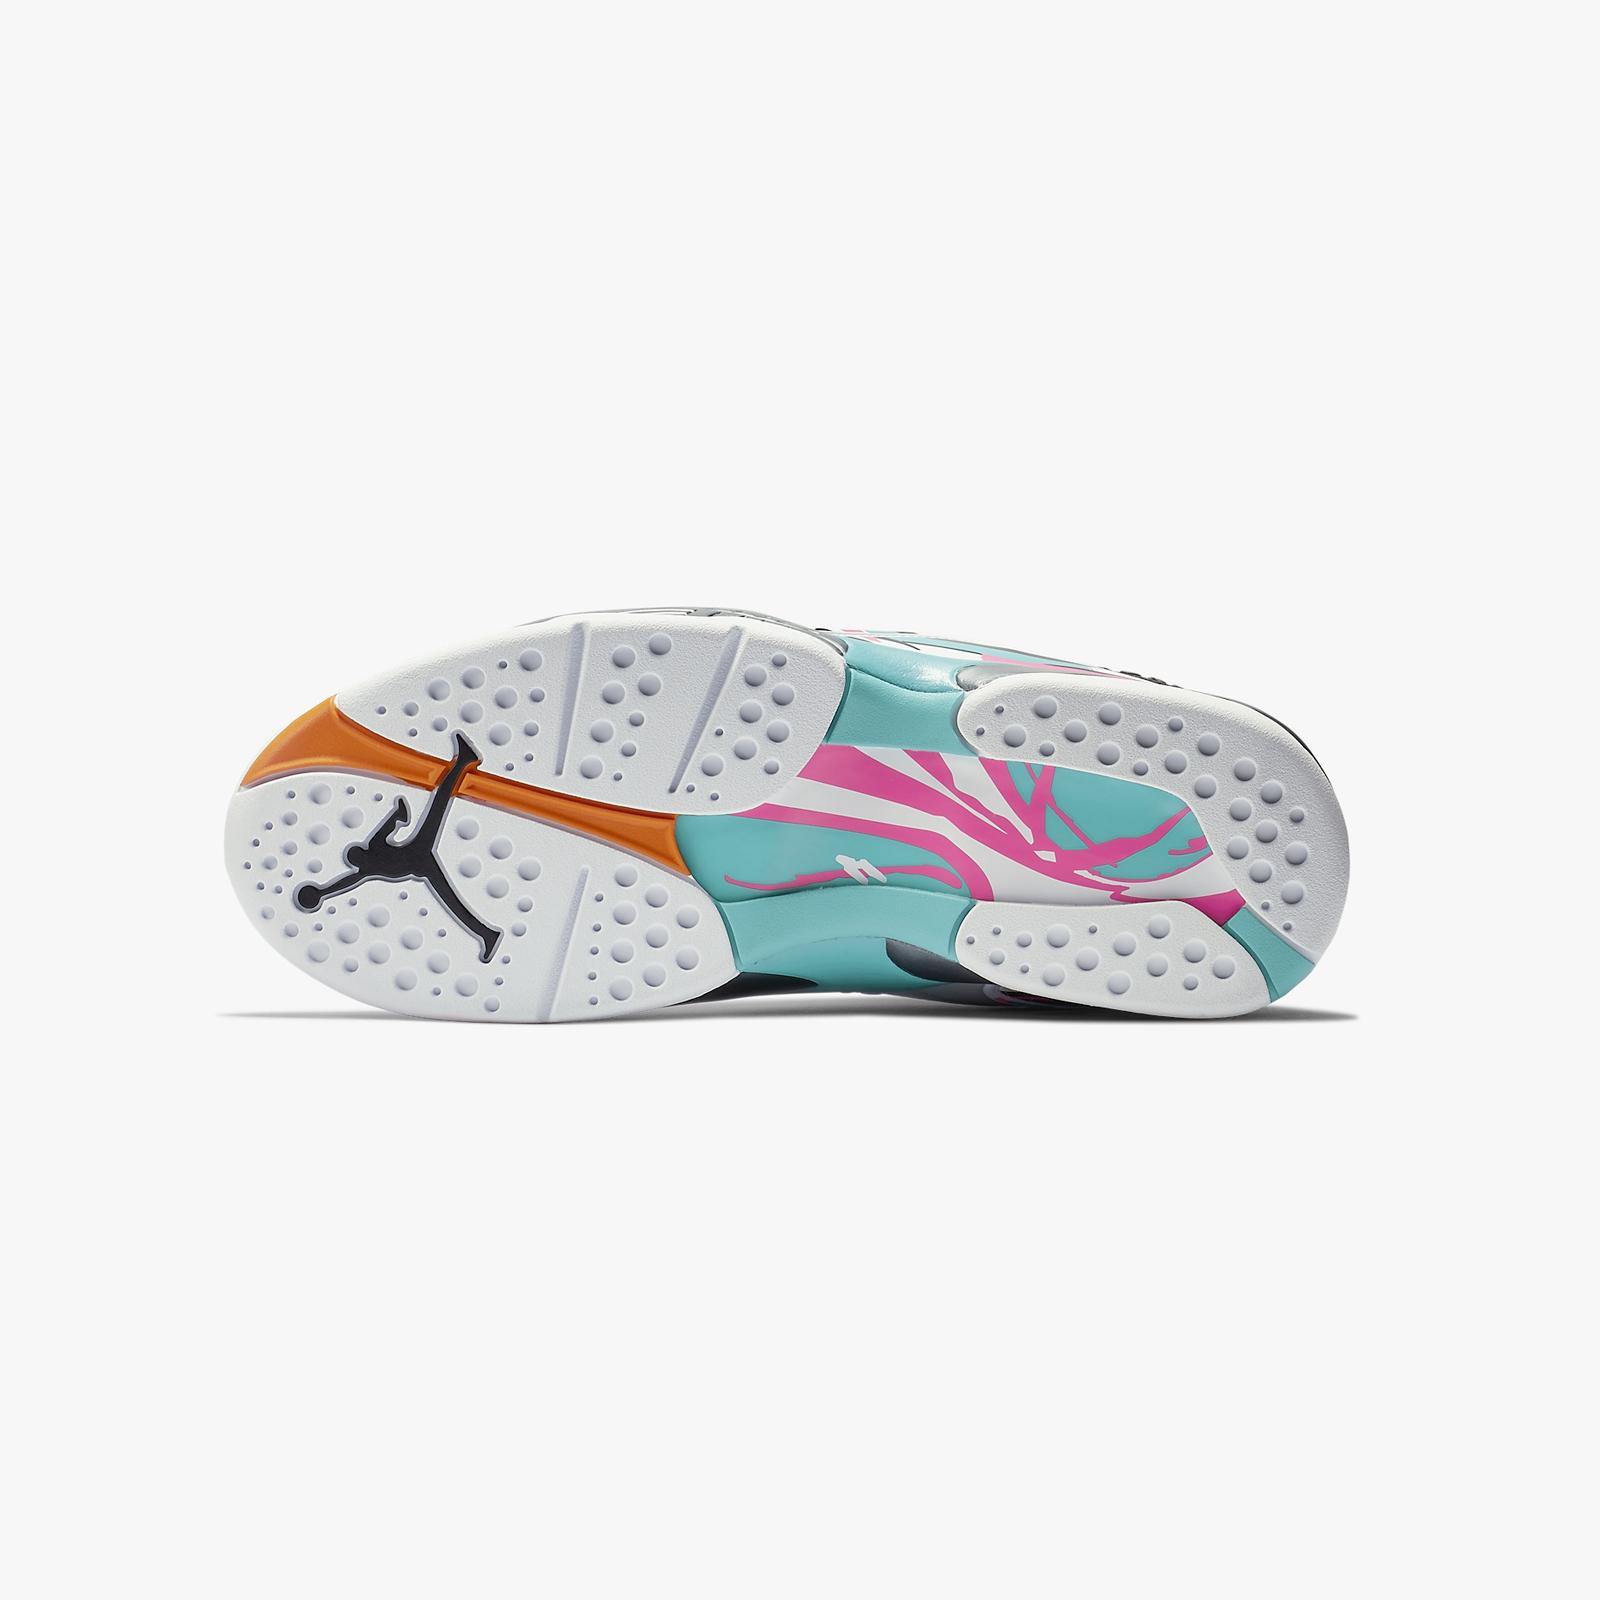 c62411a5362 Jordan Brand Air Jordan 8 Retro - 305381-113 - Sneakersnstuff ...